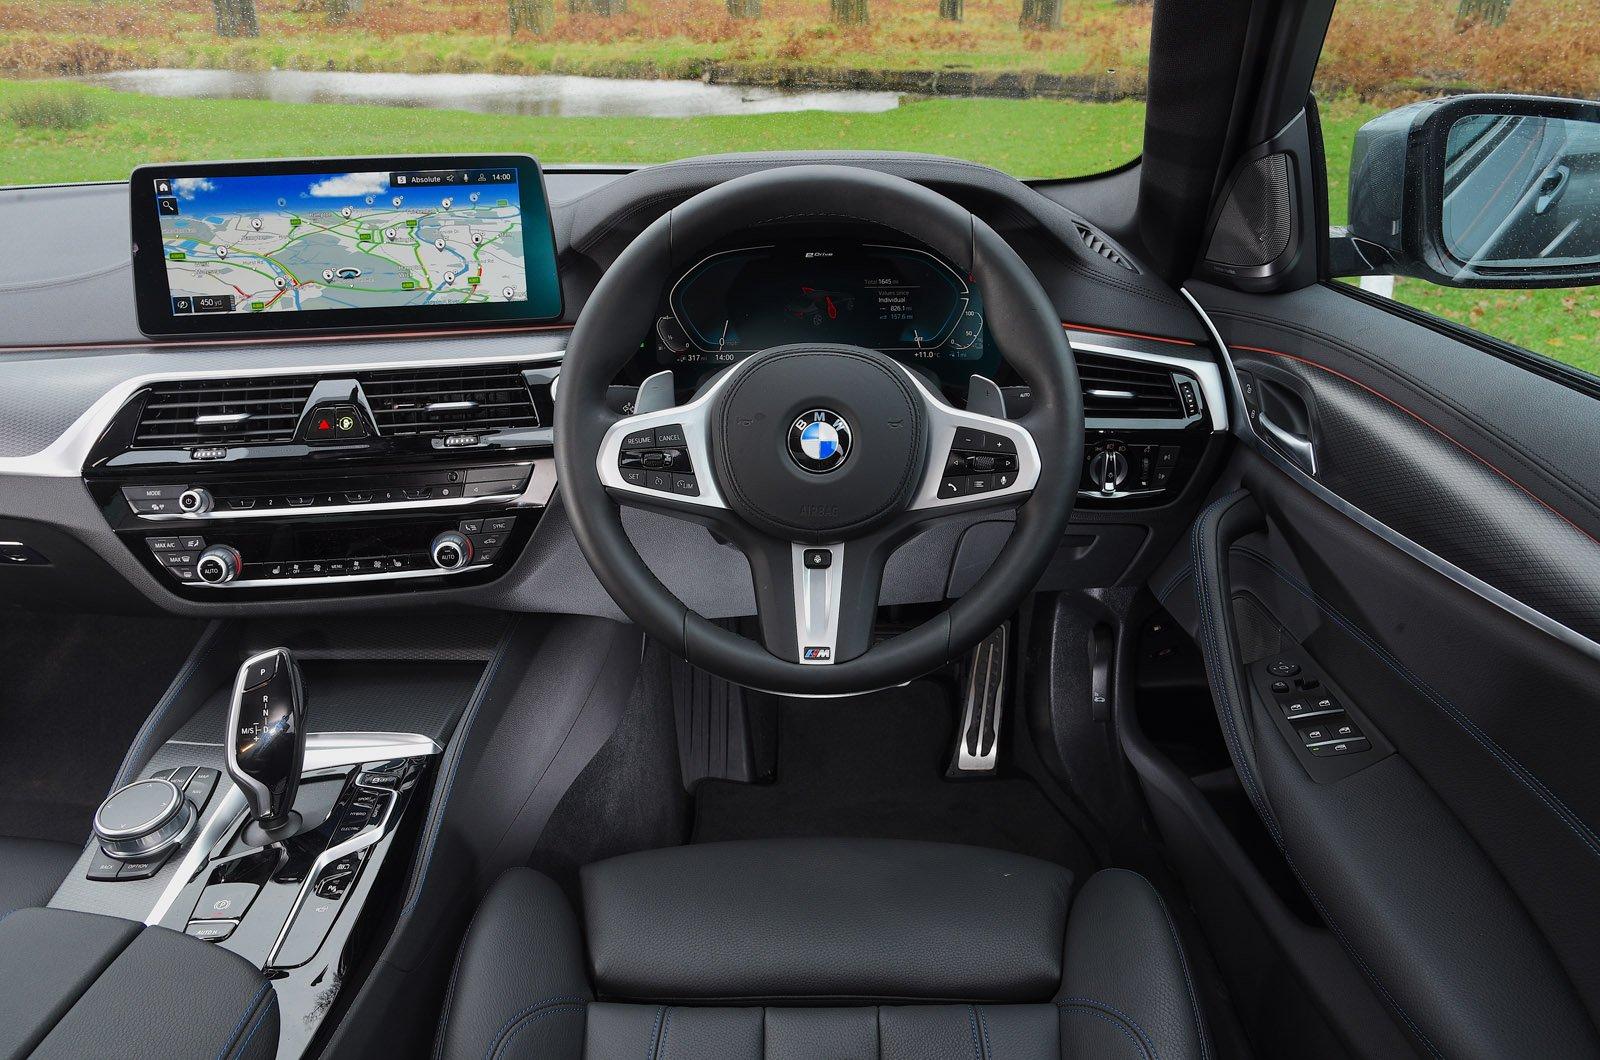 LT BMW 530e dashboard